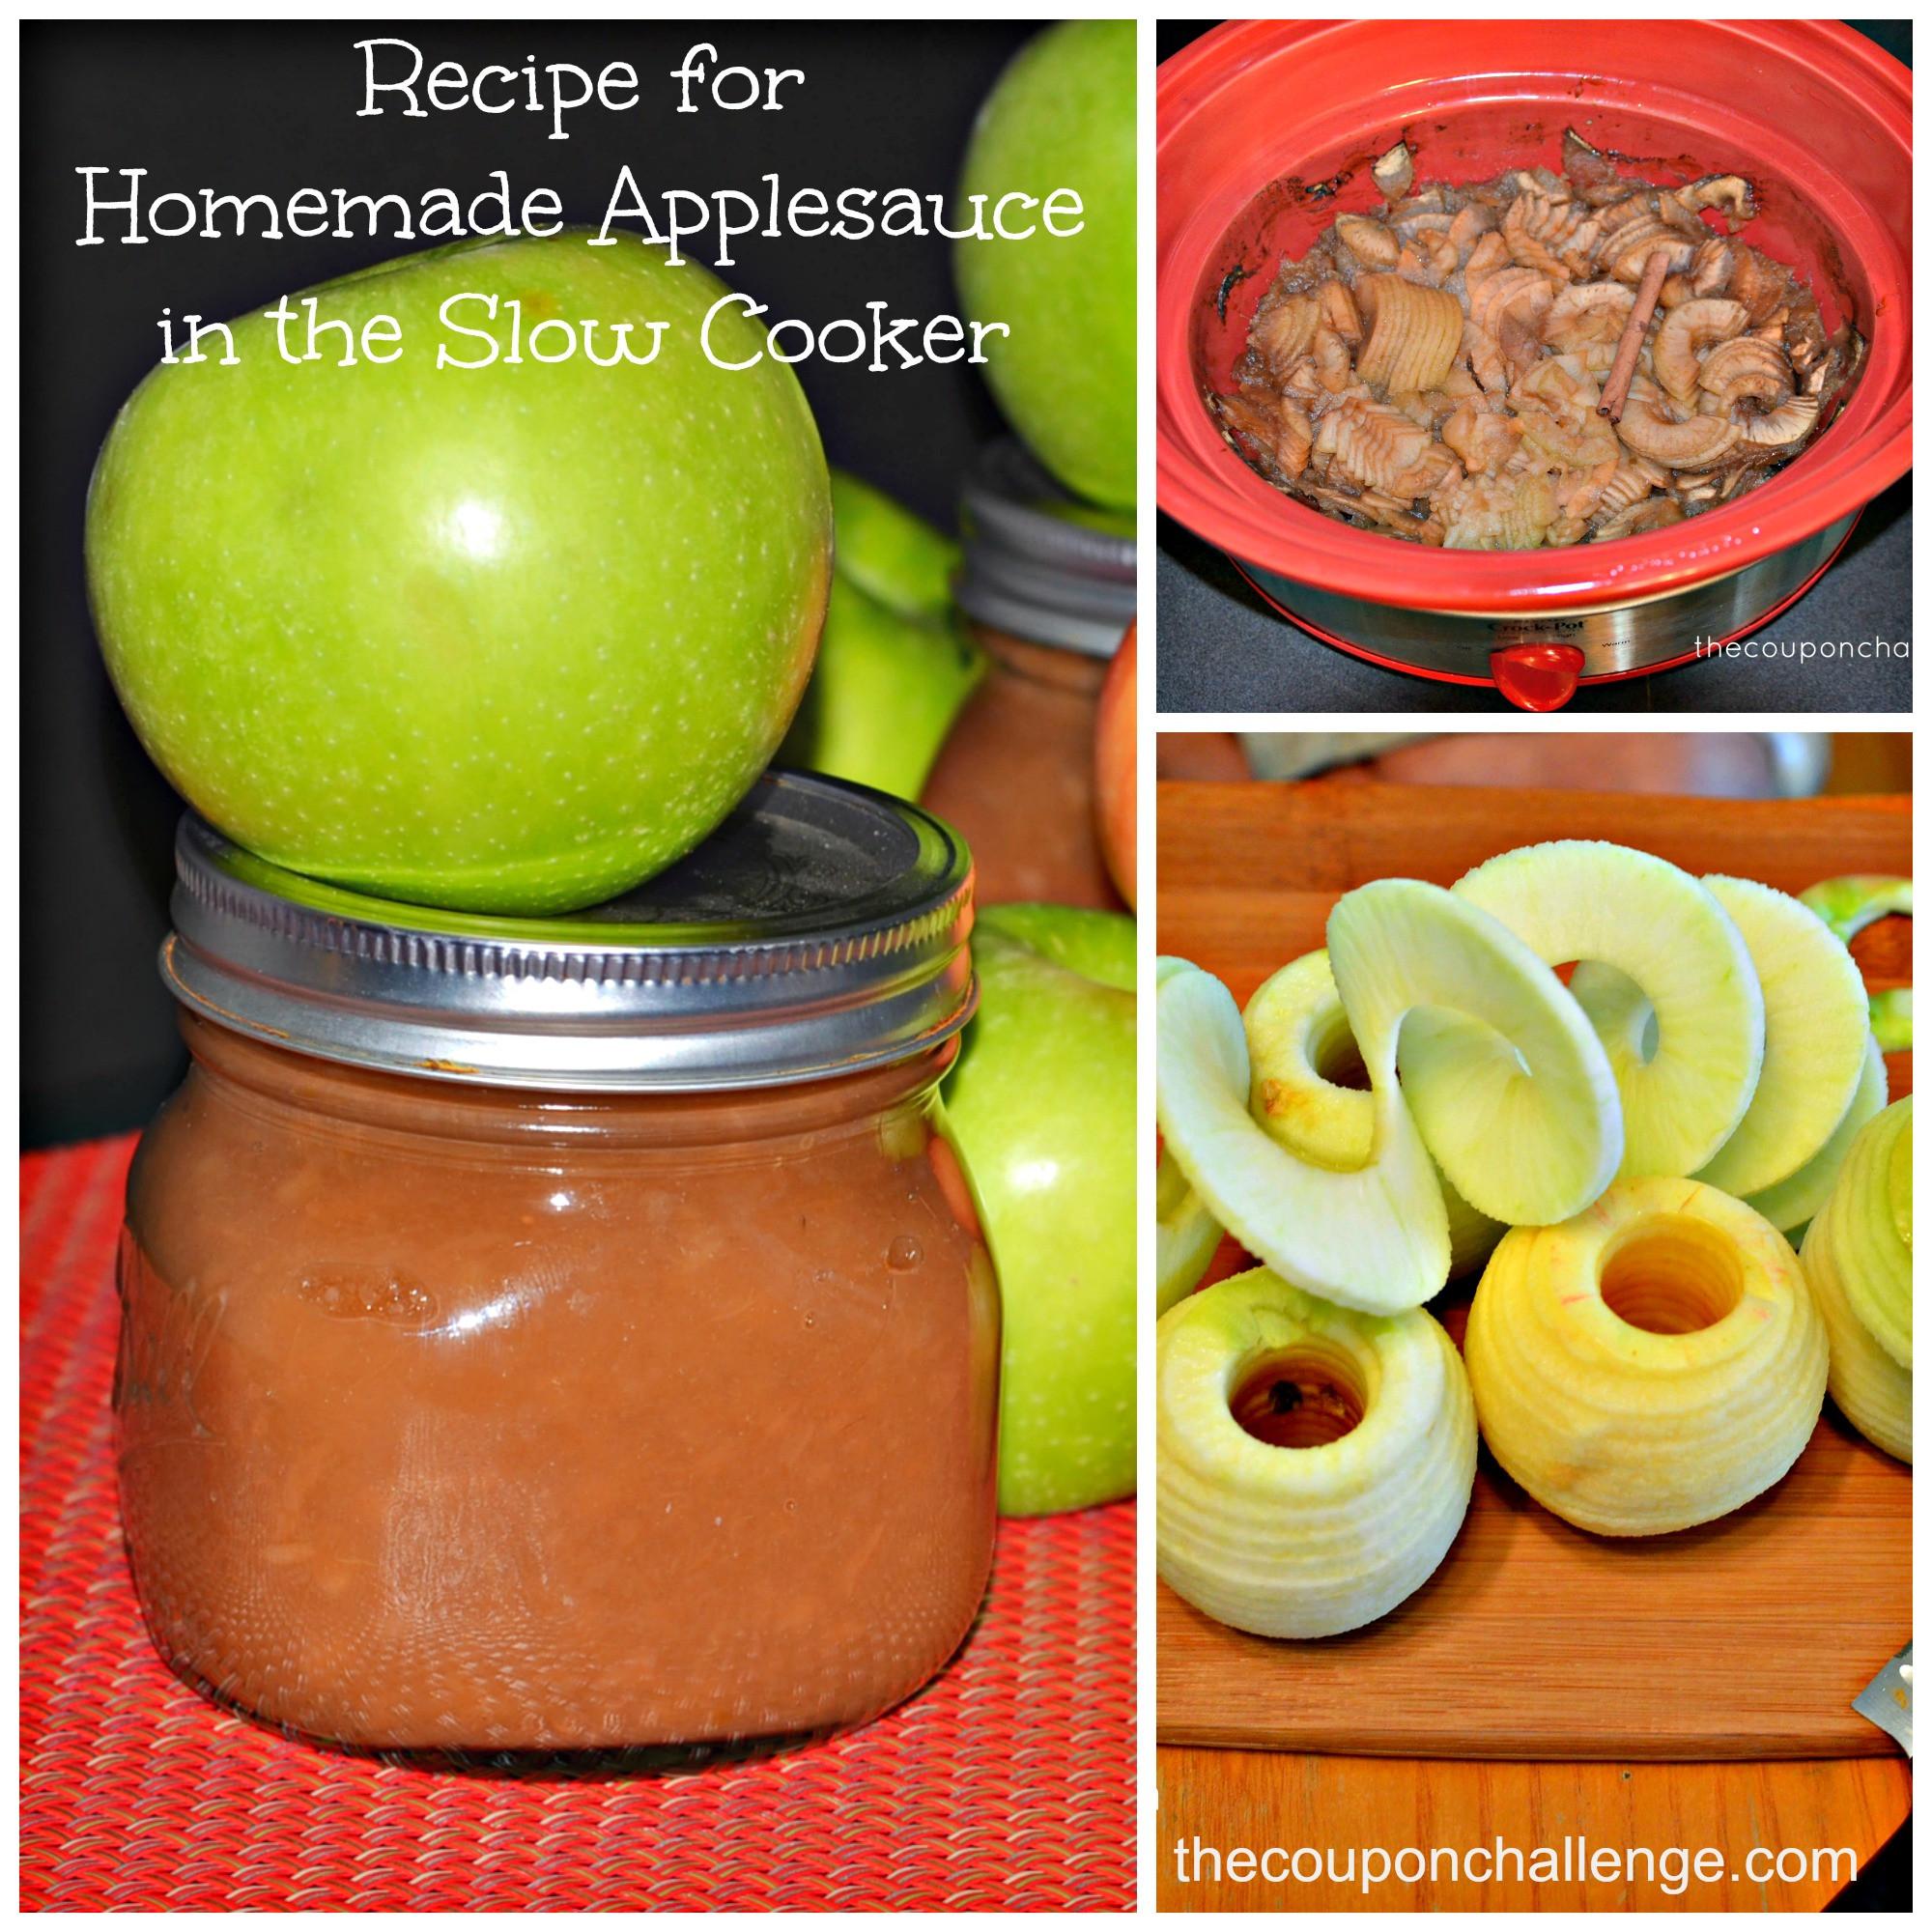 Recipe For Applesauce  Recipe for Homemade Applesauce in the Slow Cooker